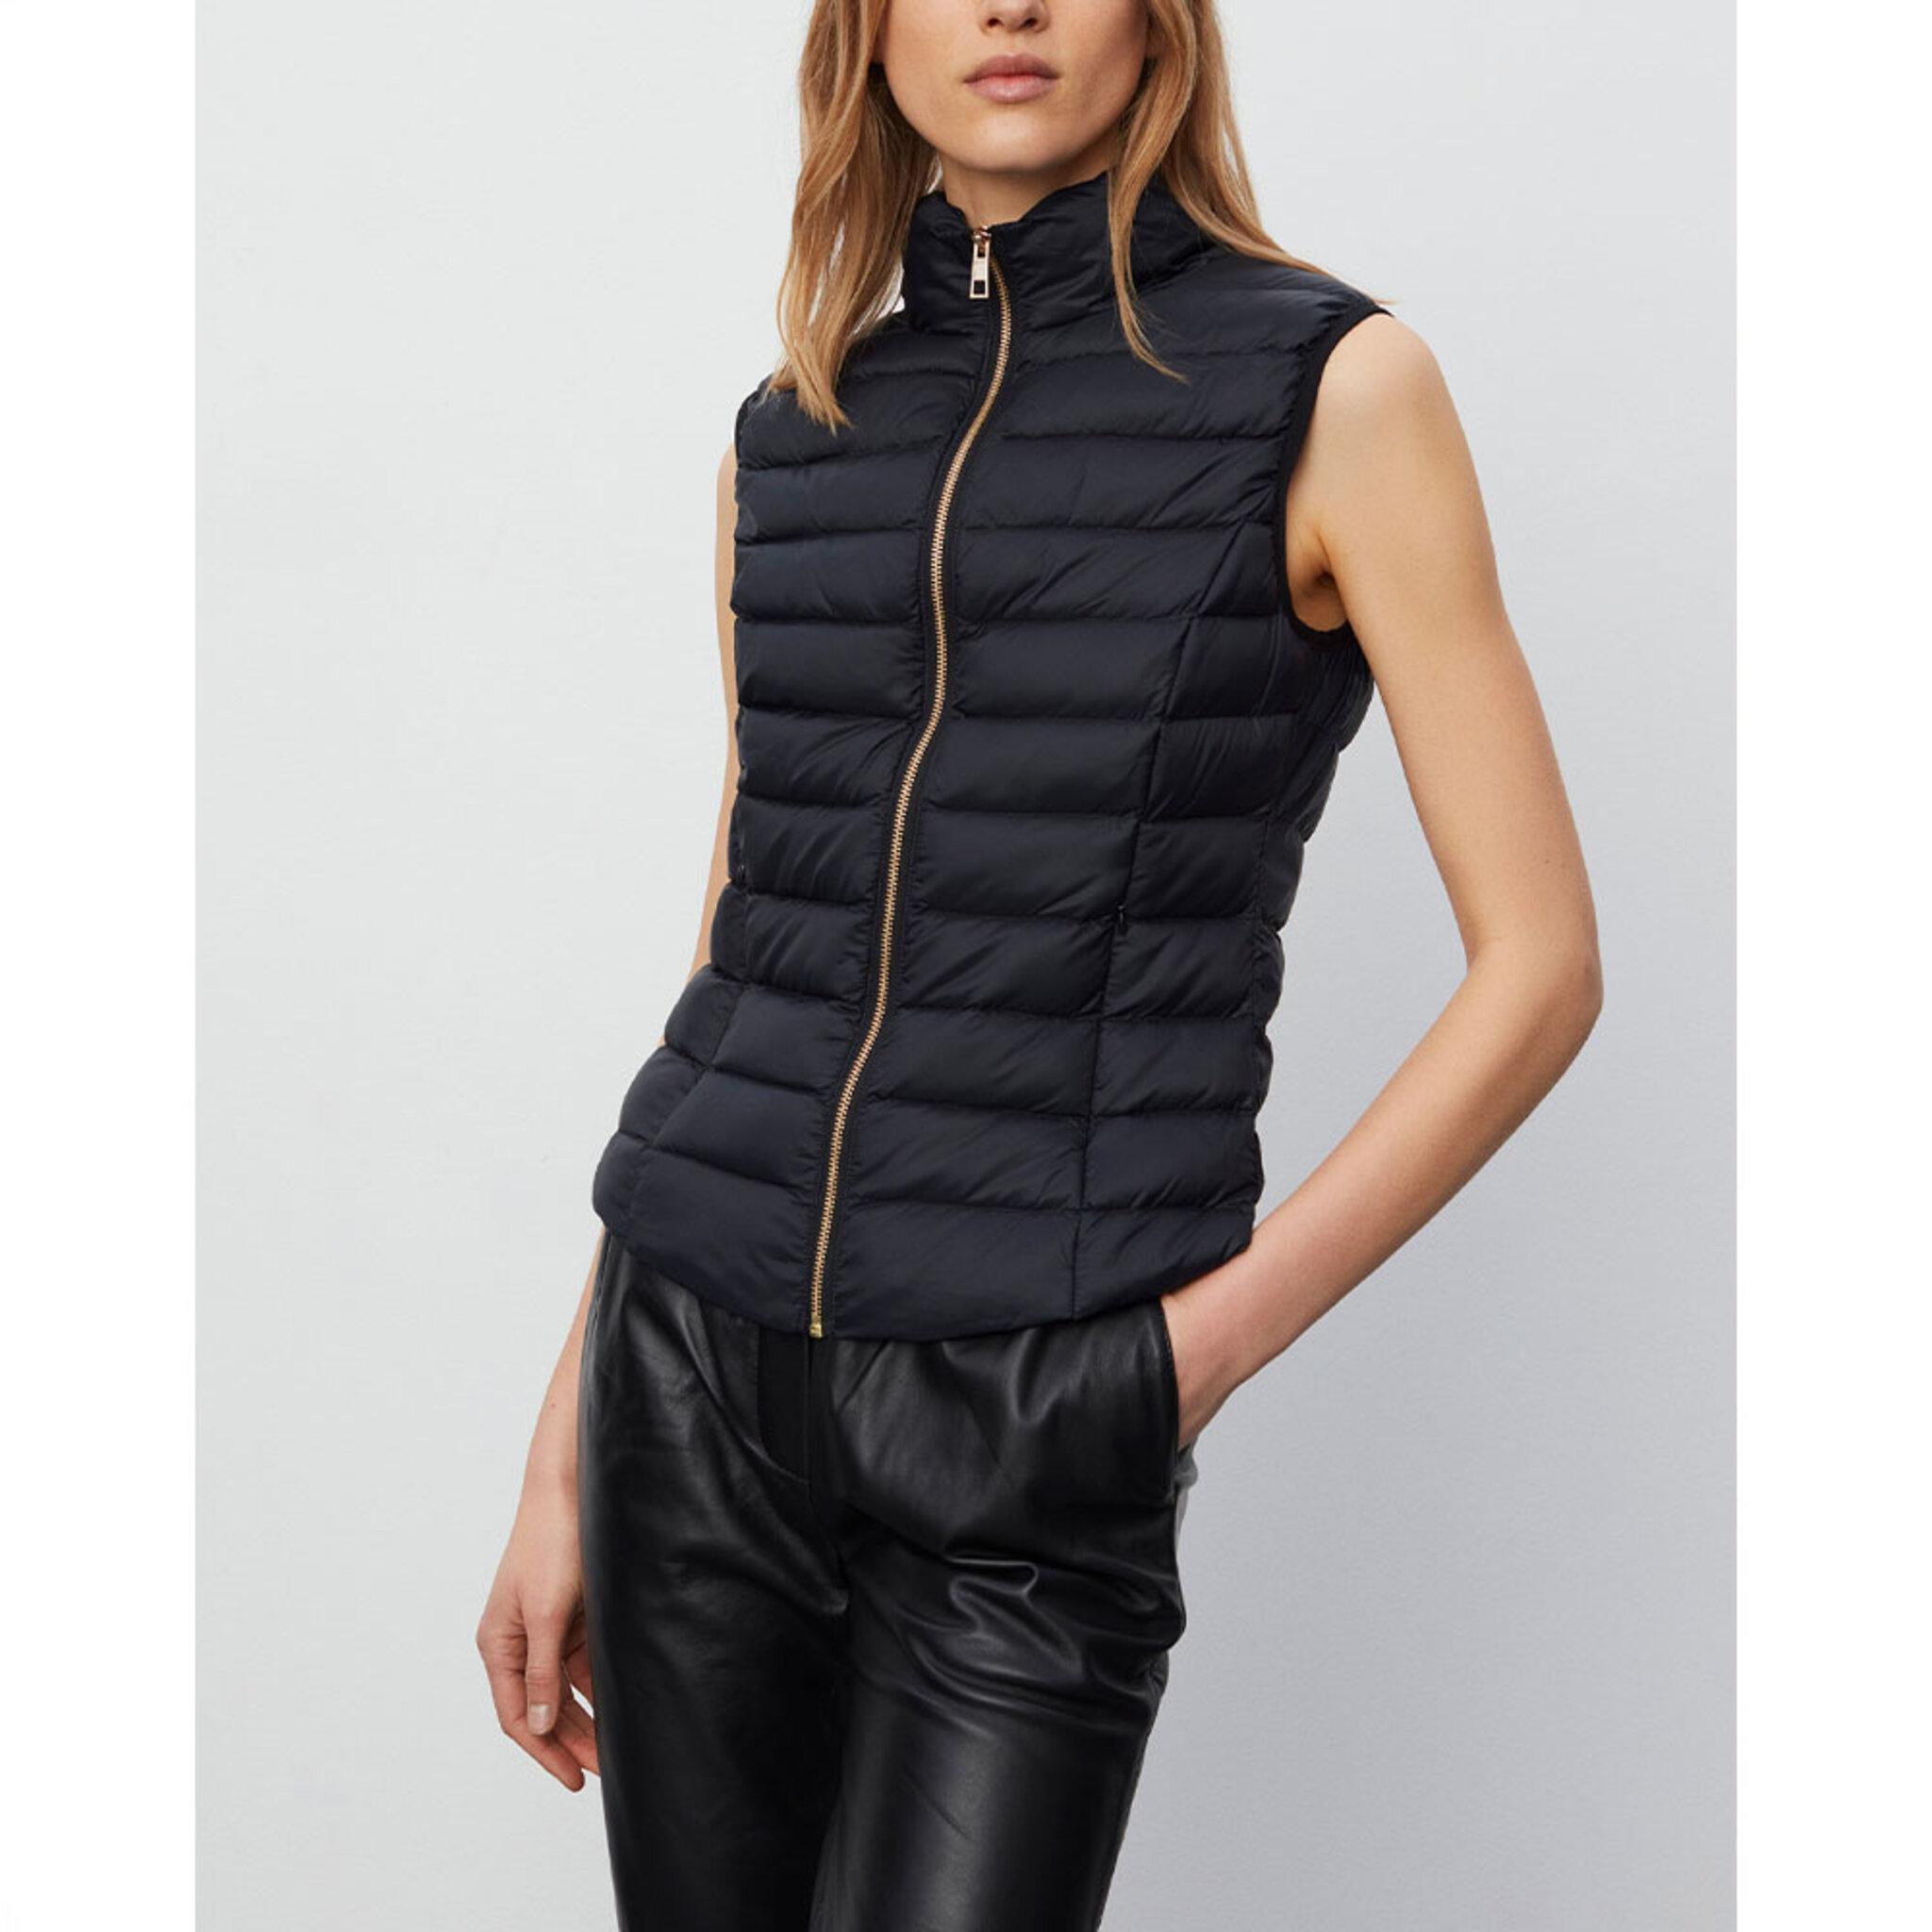 Dune Outerwear Jacket